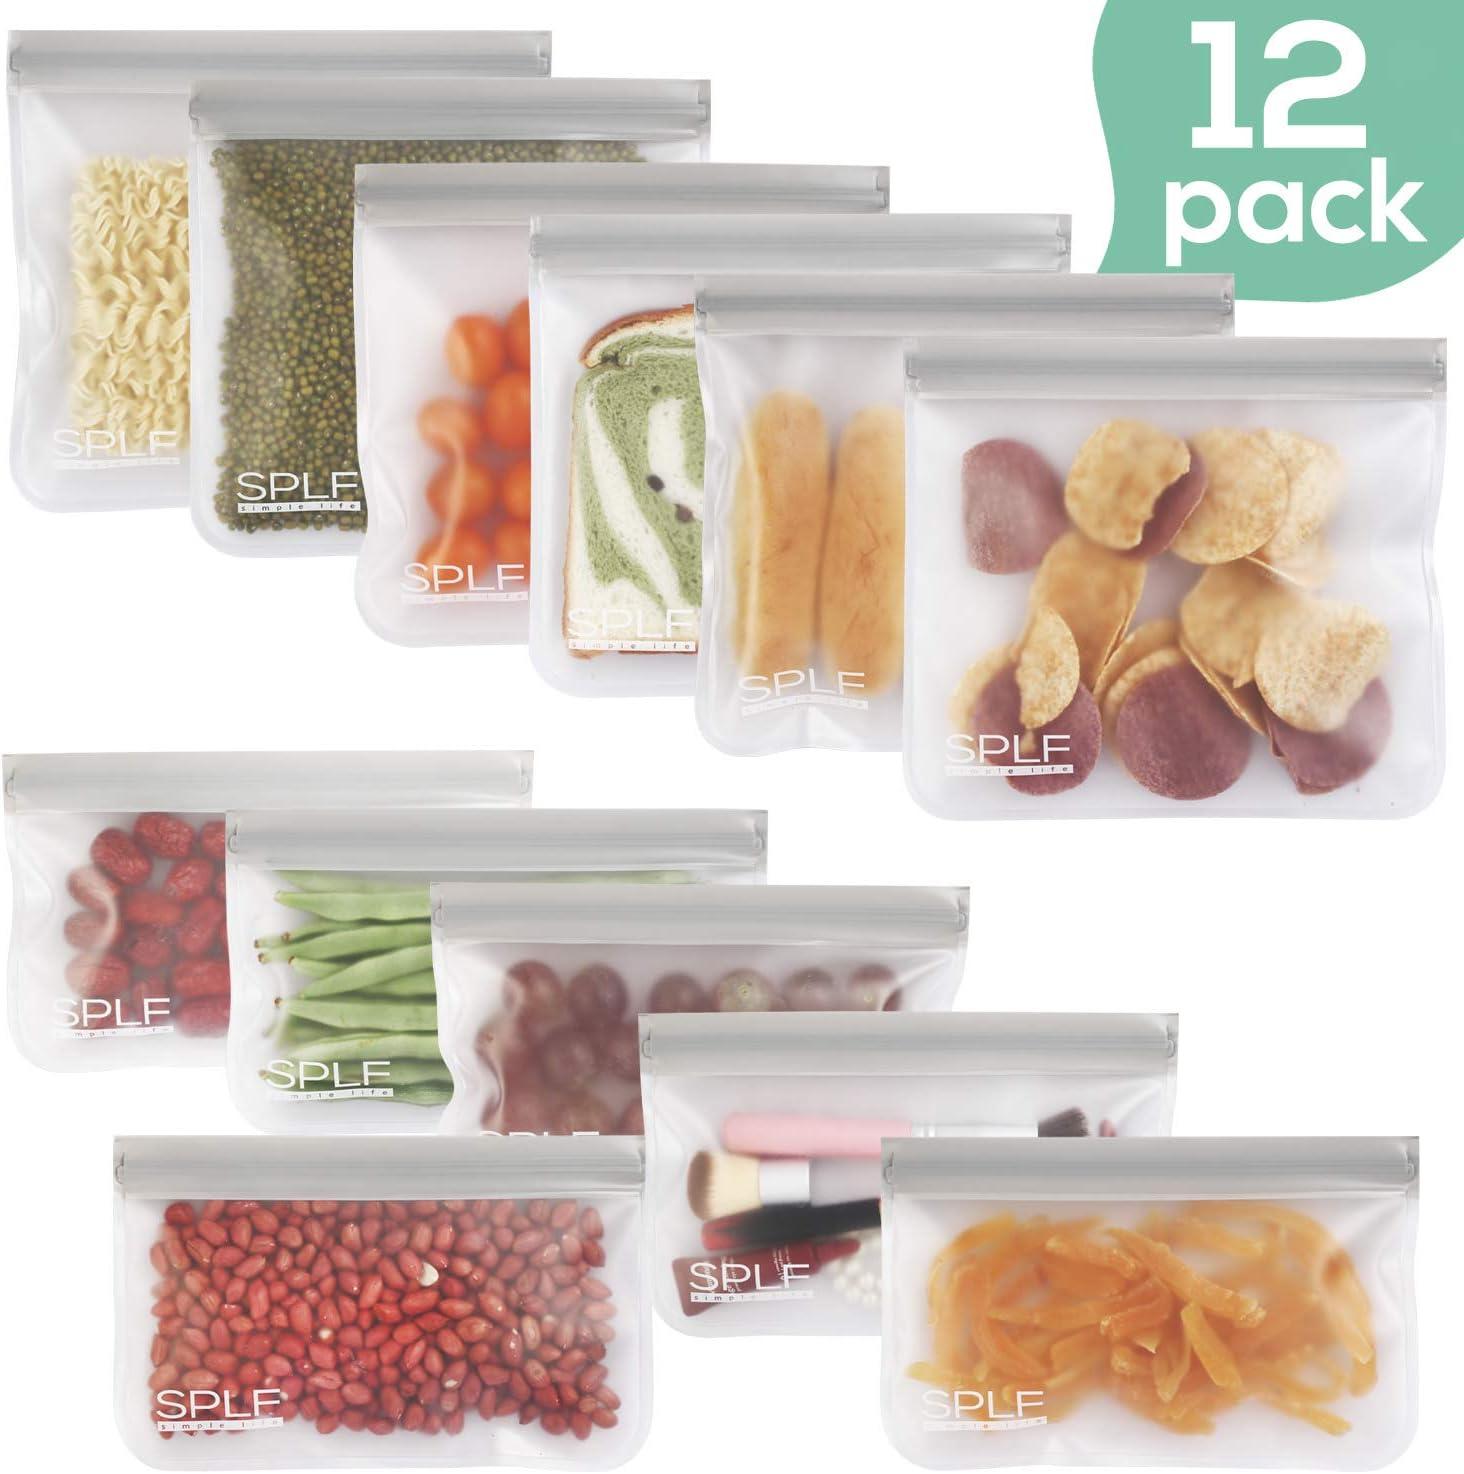 SPLF 12 Pack Reusable Storage Bags